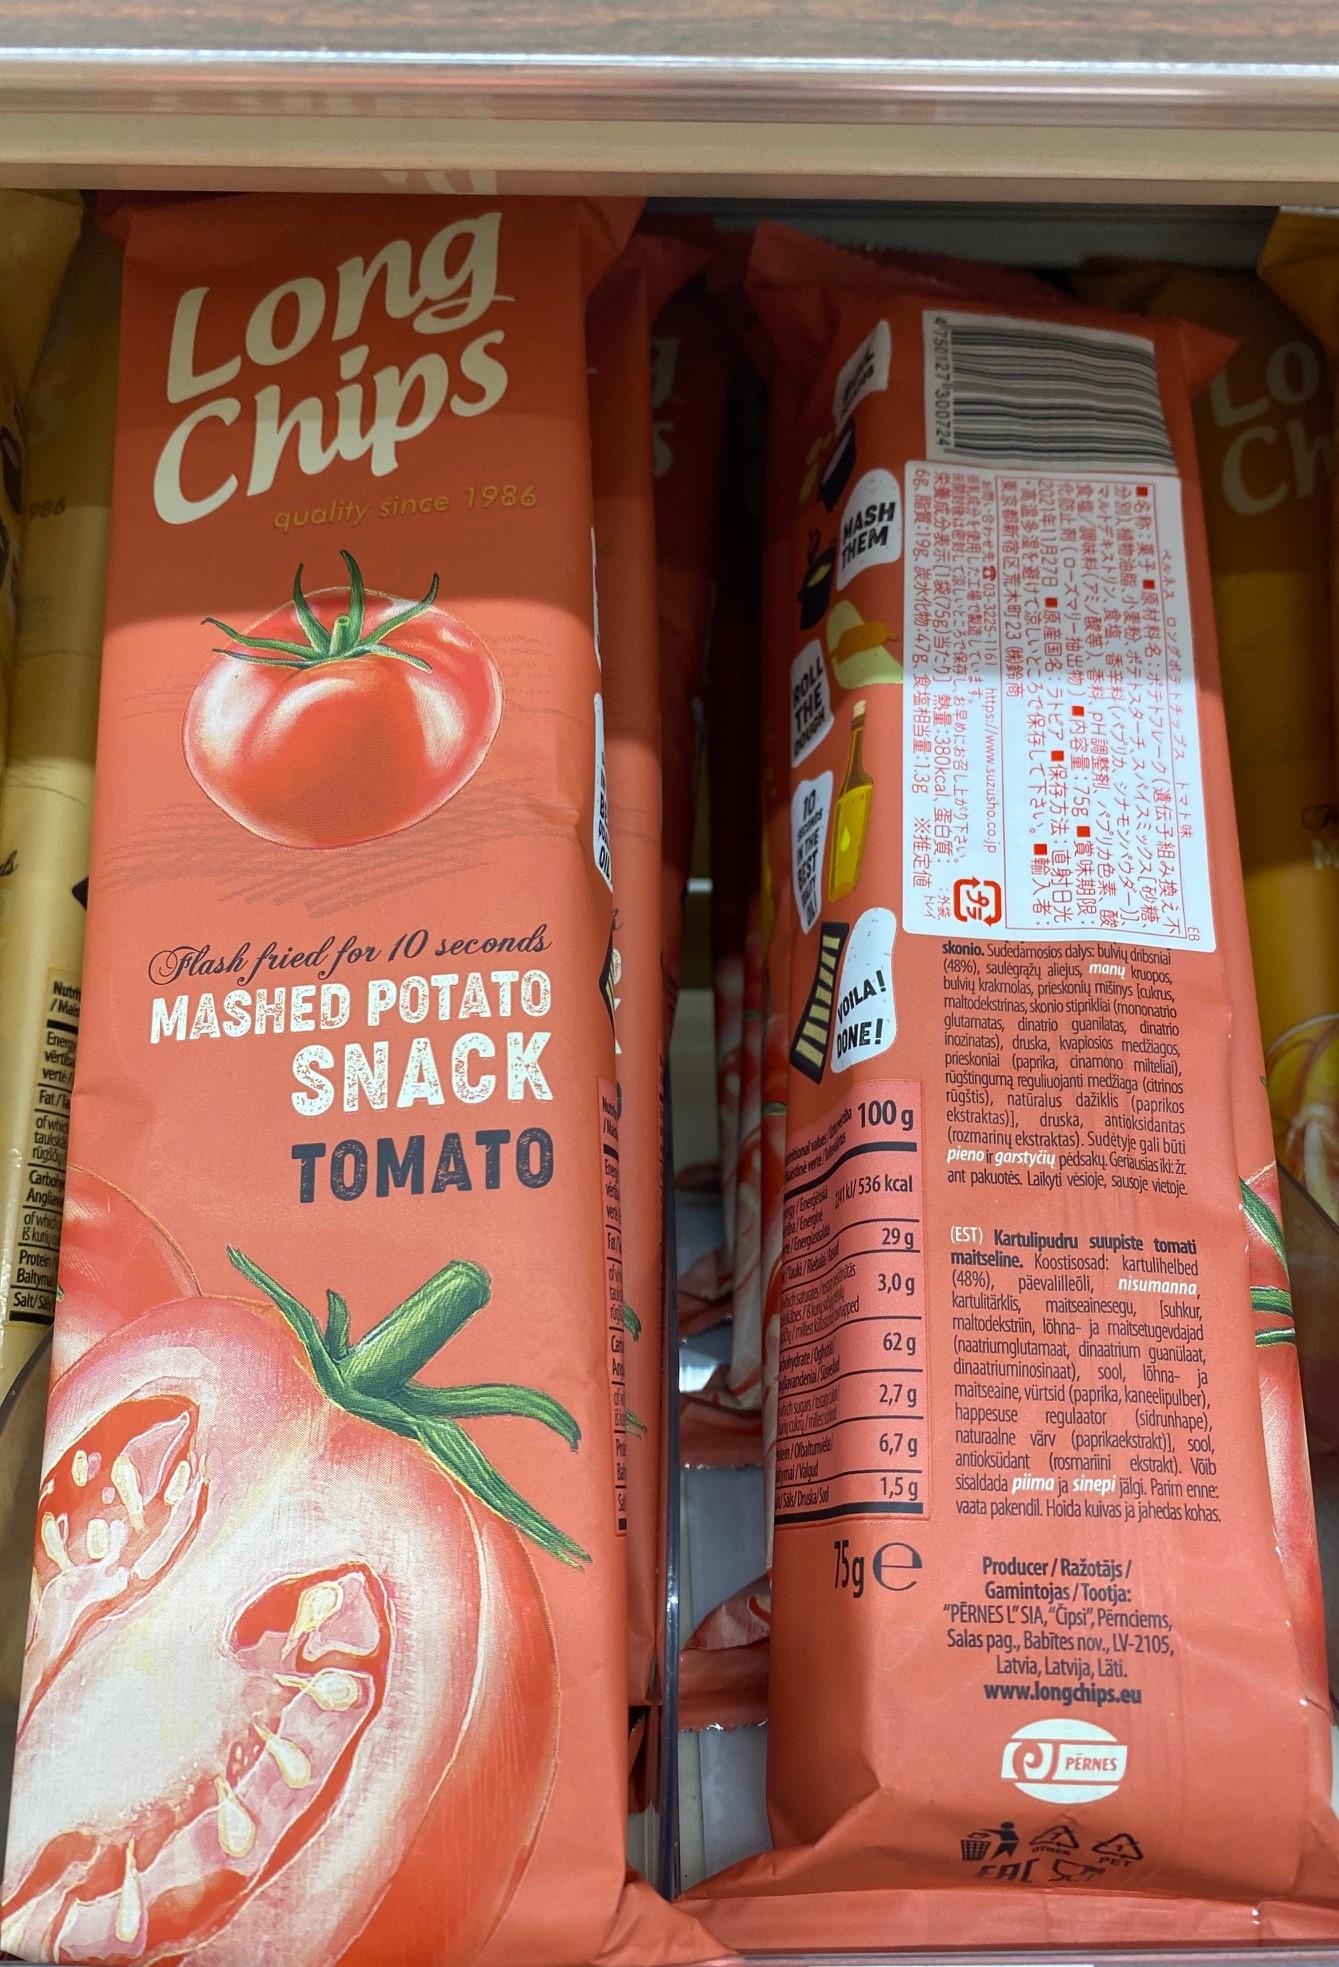 Natural Lawson, Pernes Long Potato Chips, Tomato flavoured